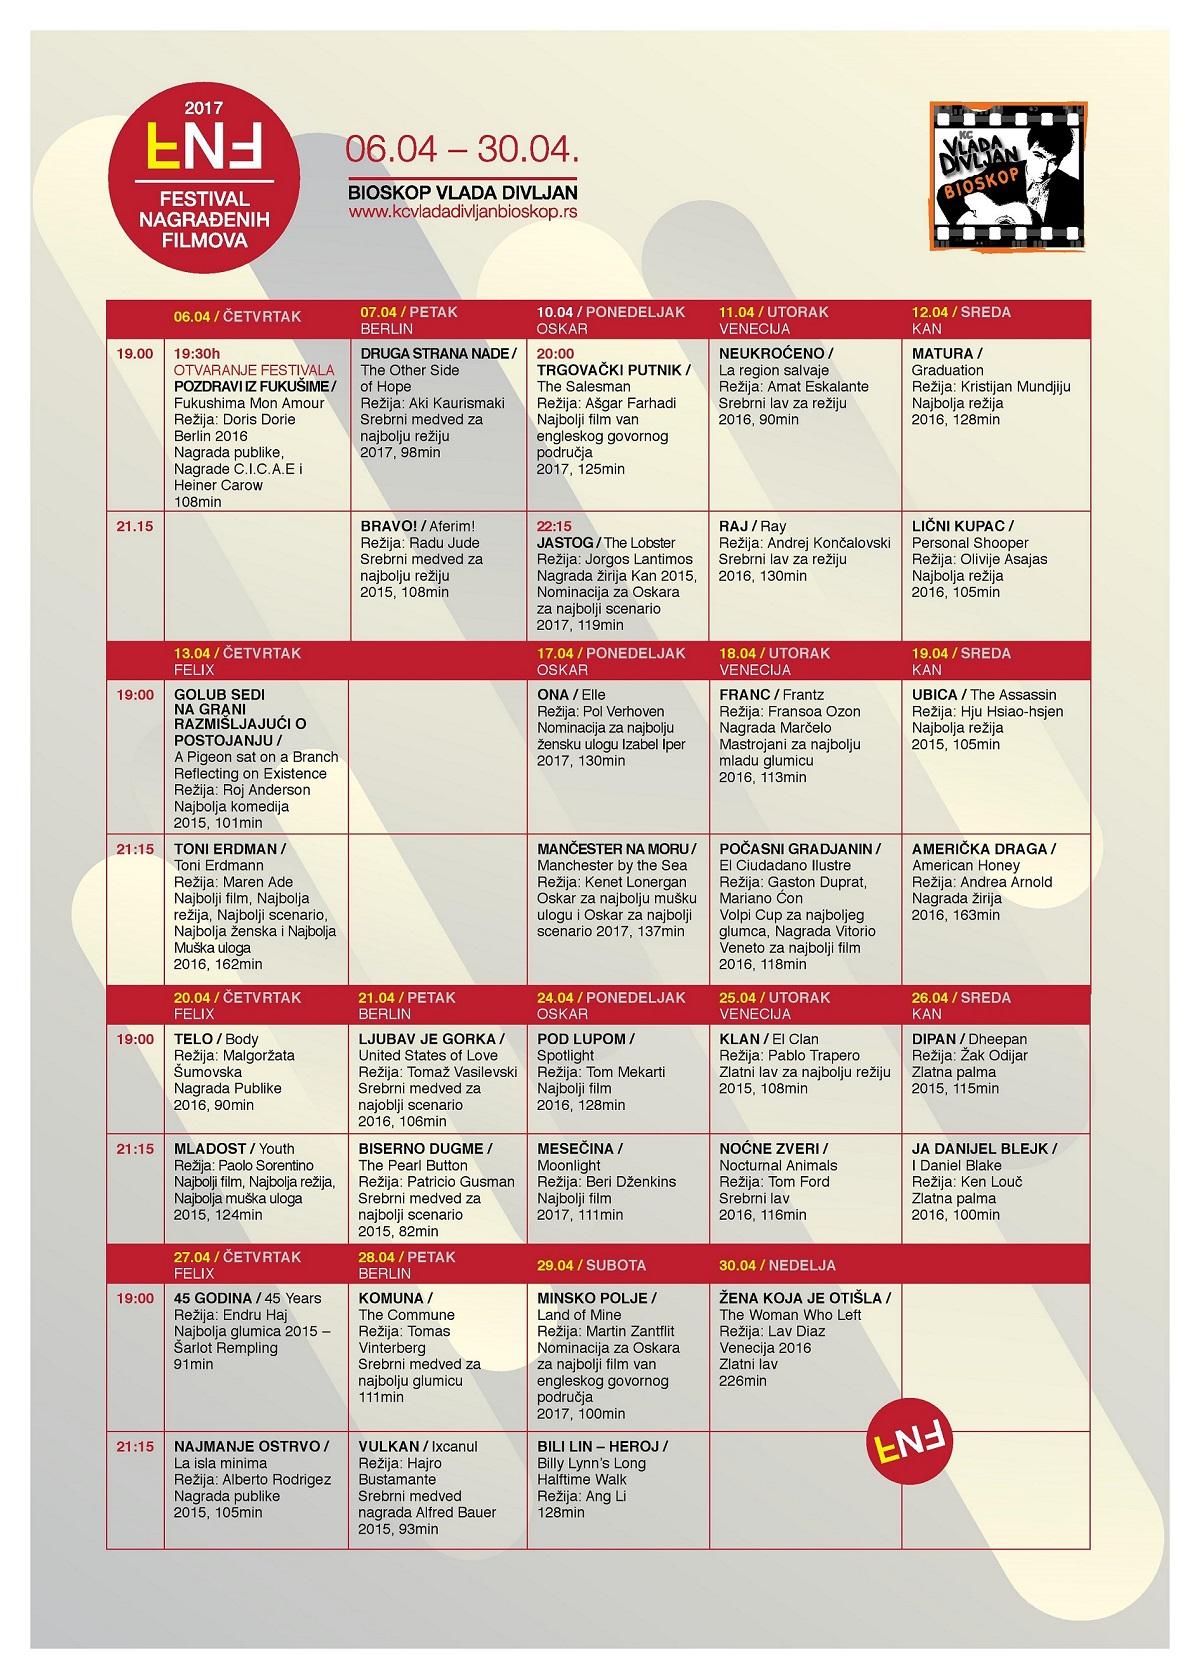 Festival nagrađenih filmova 2017